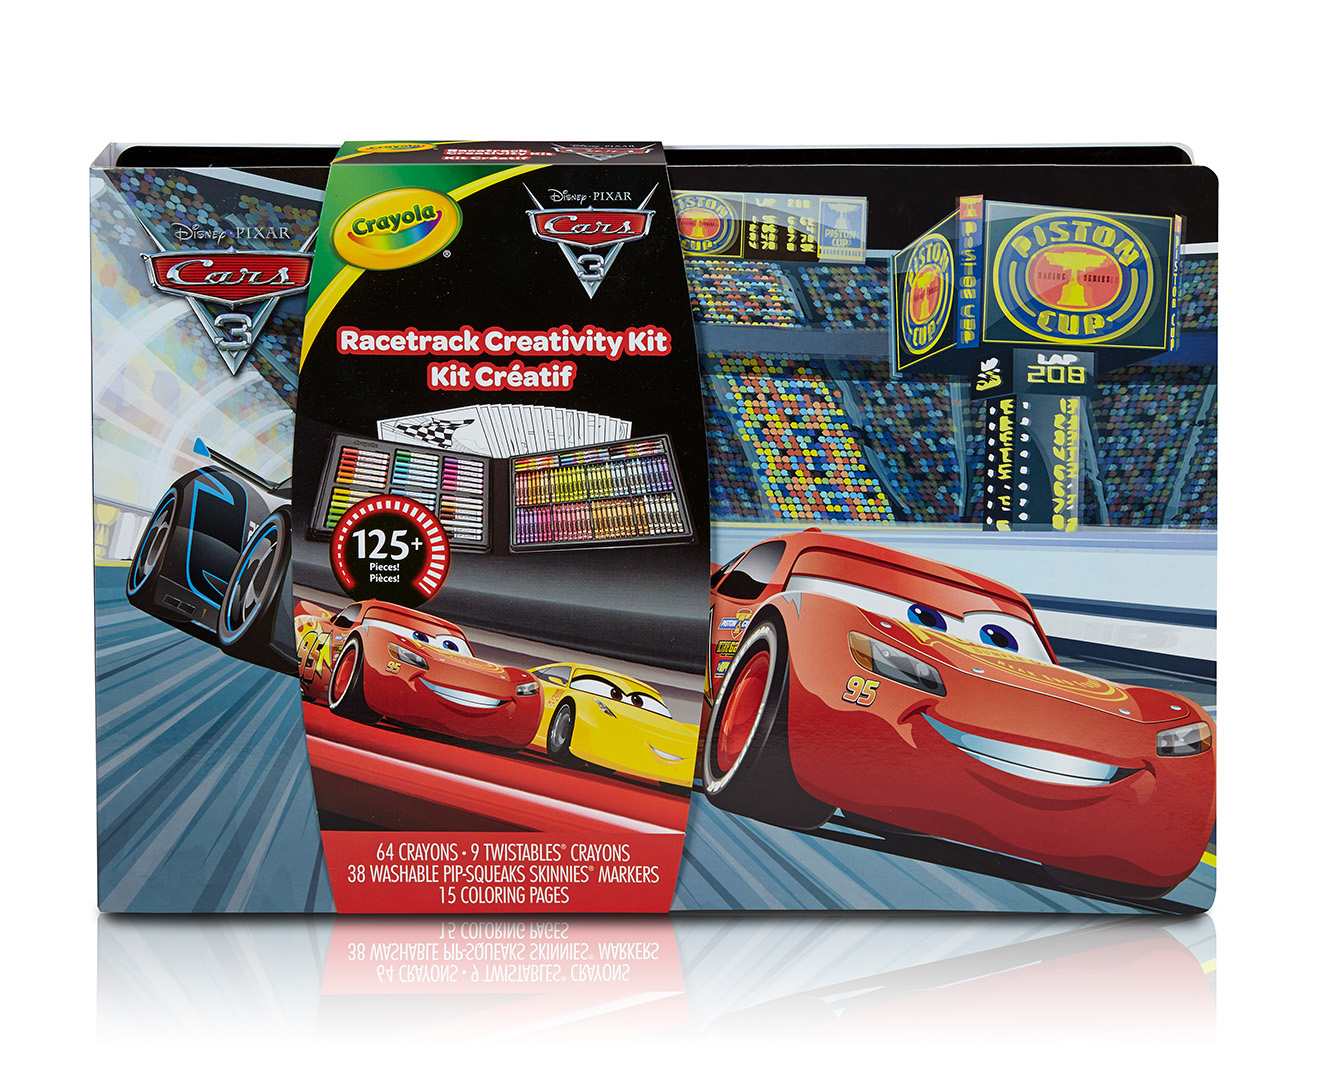 crayola disney cars 3 racetrack creativity kit catch com au